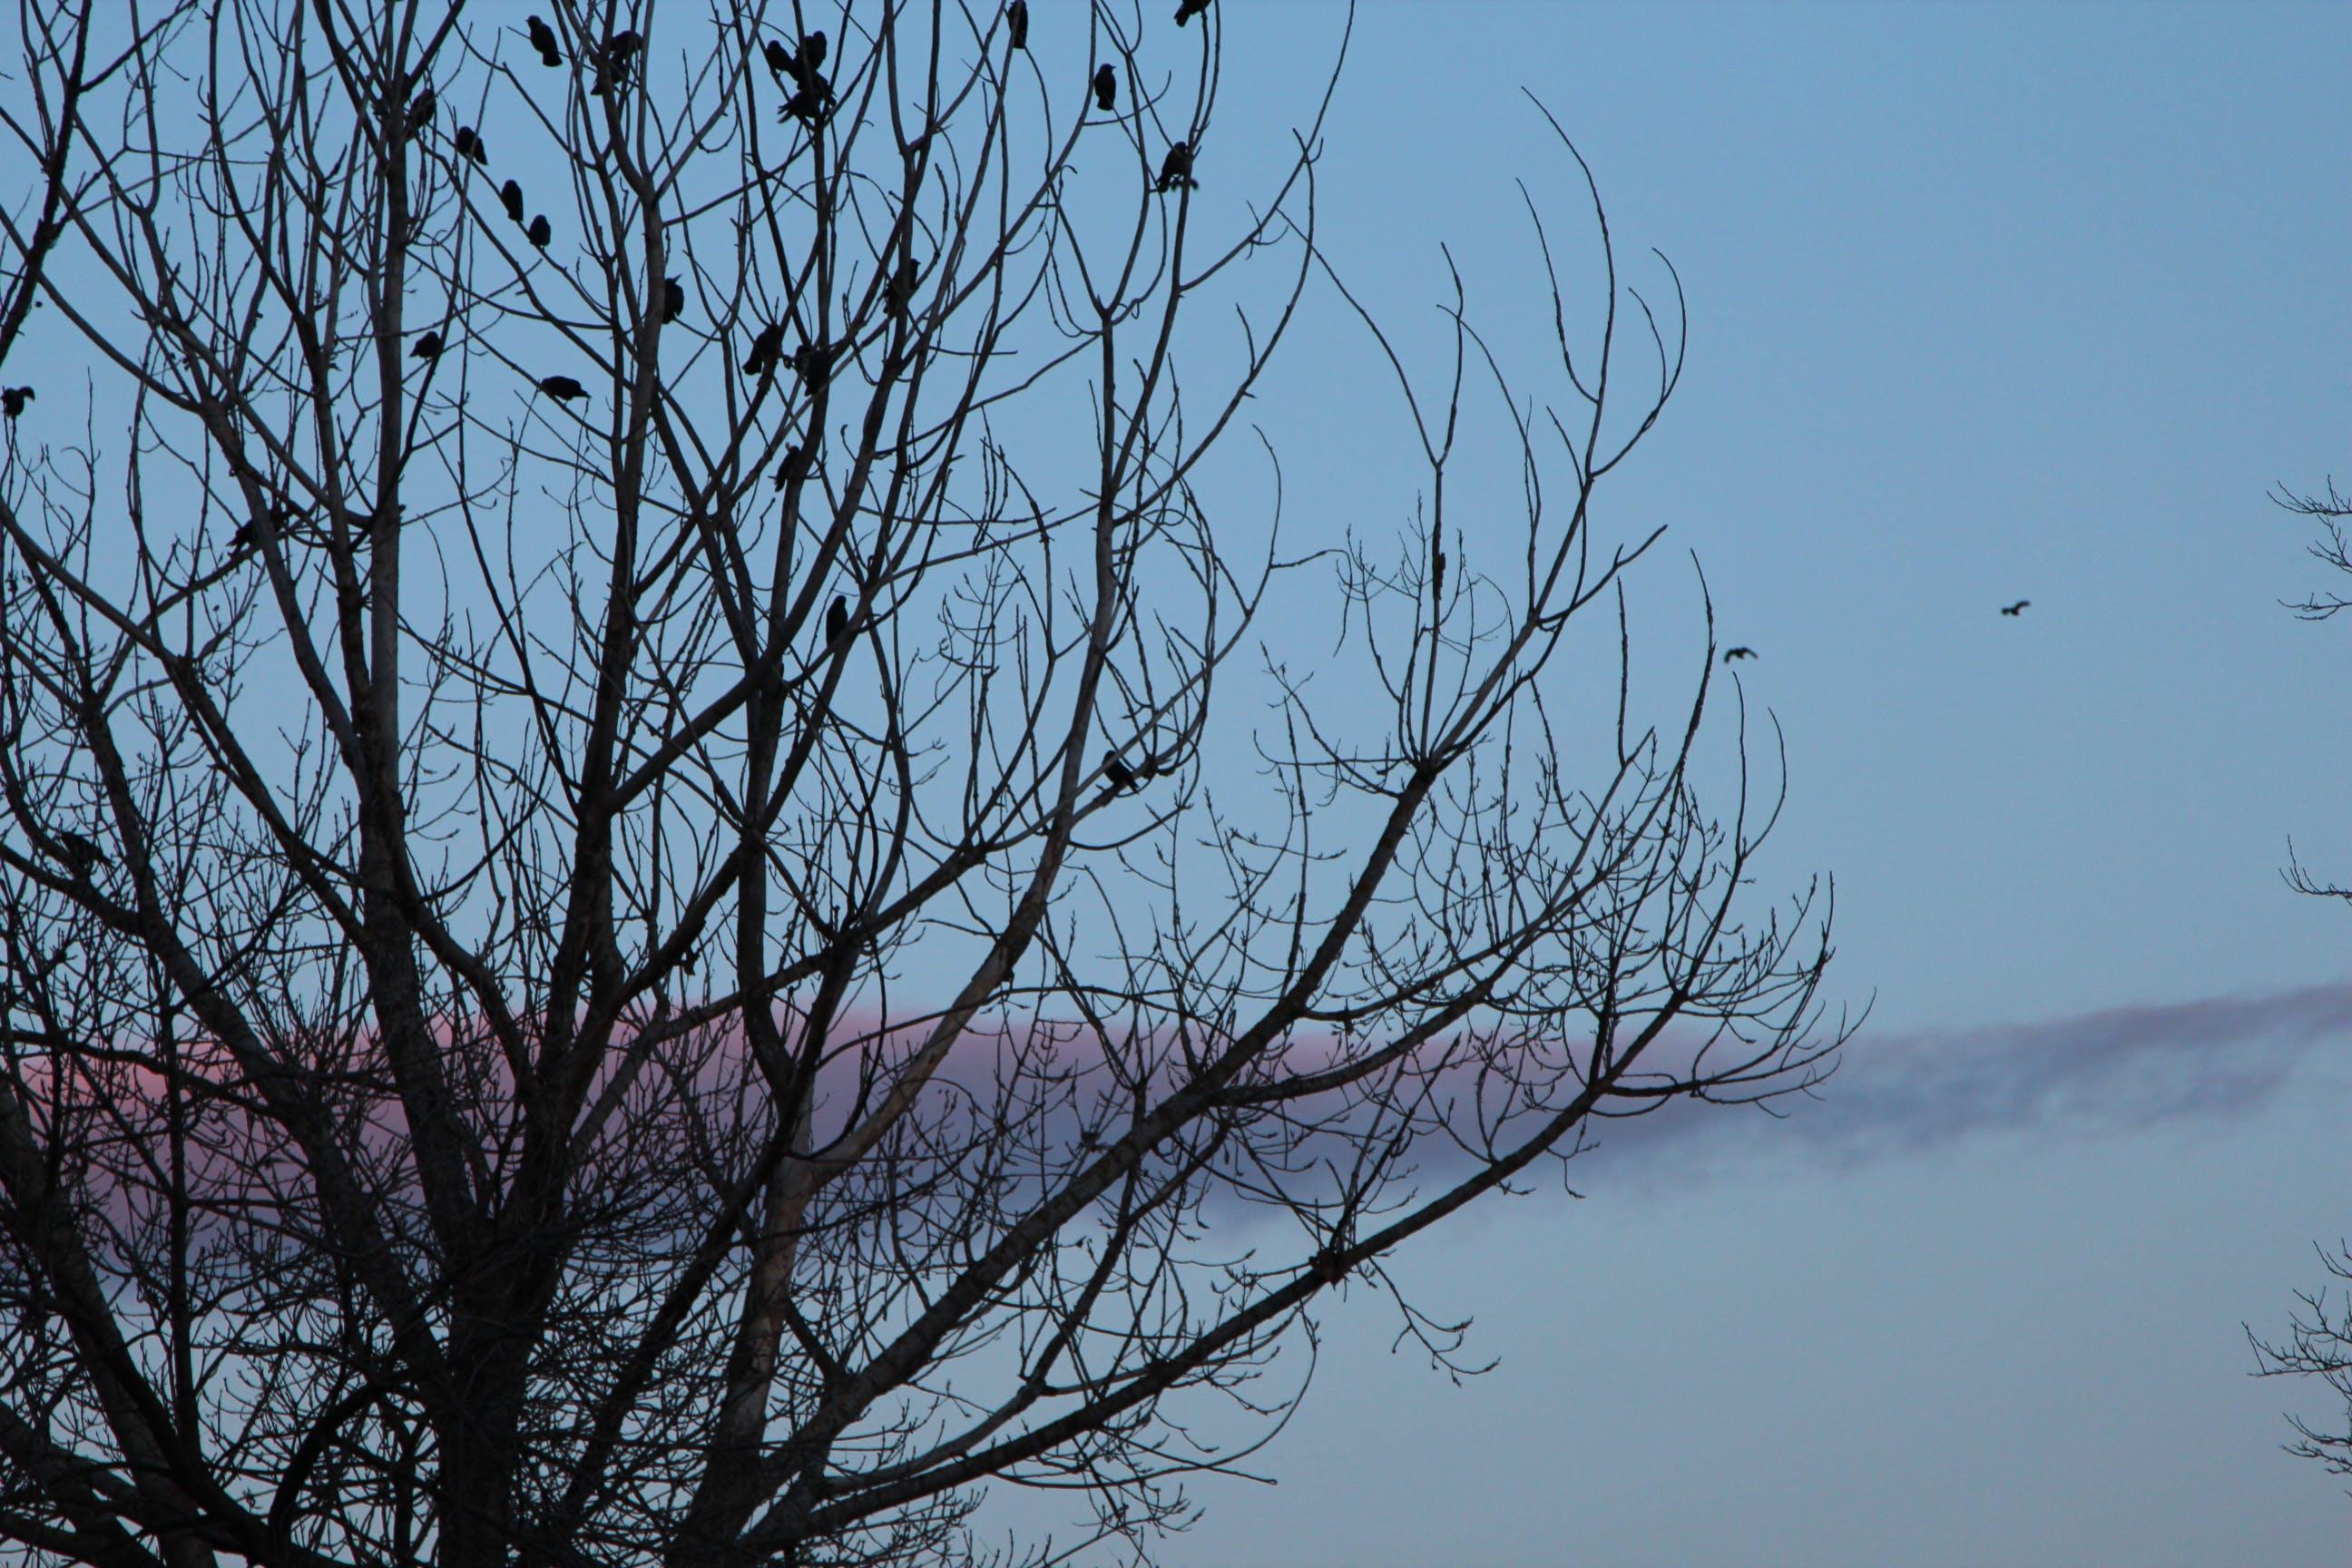 Free stock photo of #Nature #Winter #Sunshine #Sky #Bird